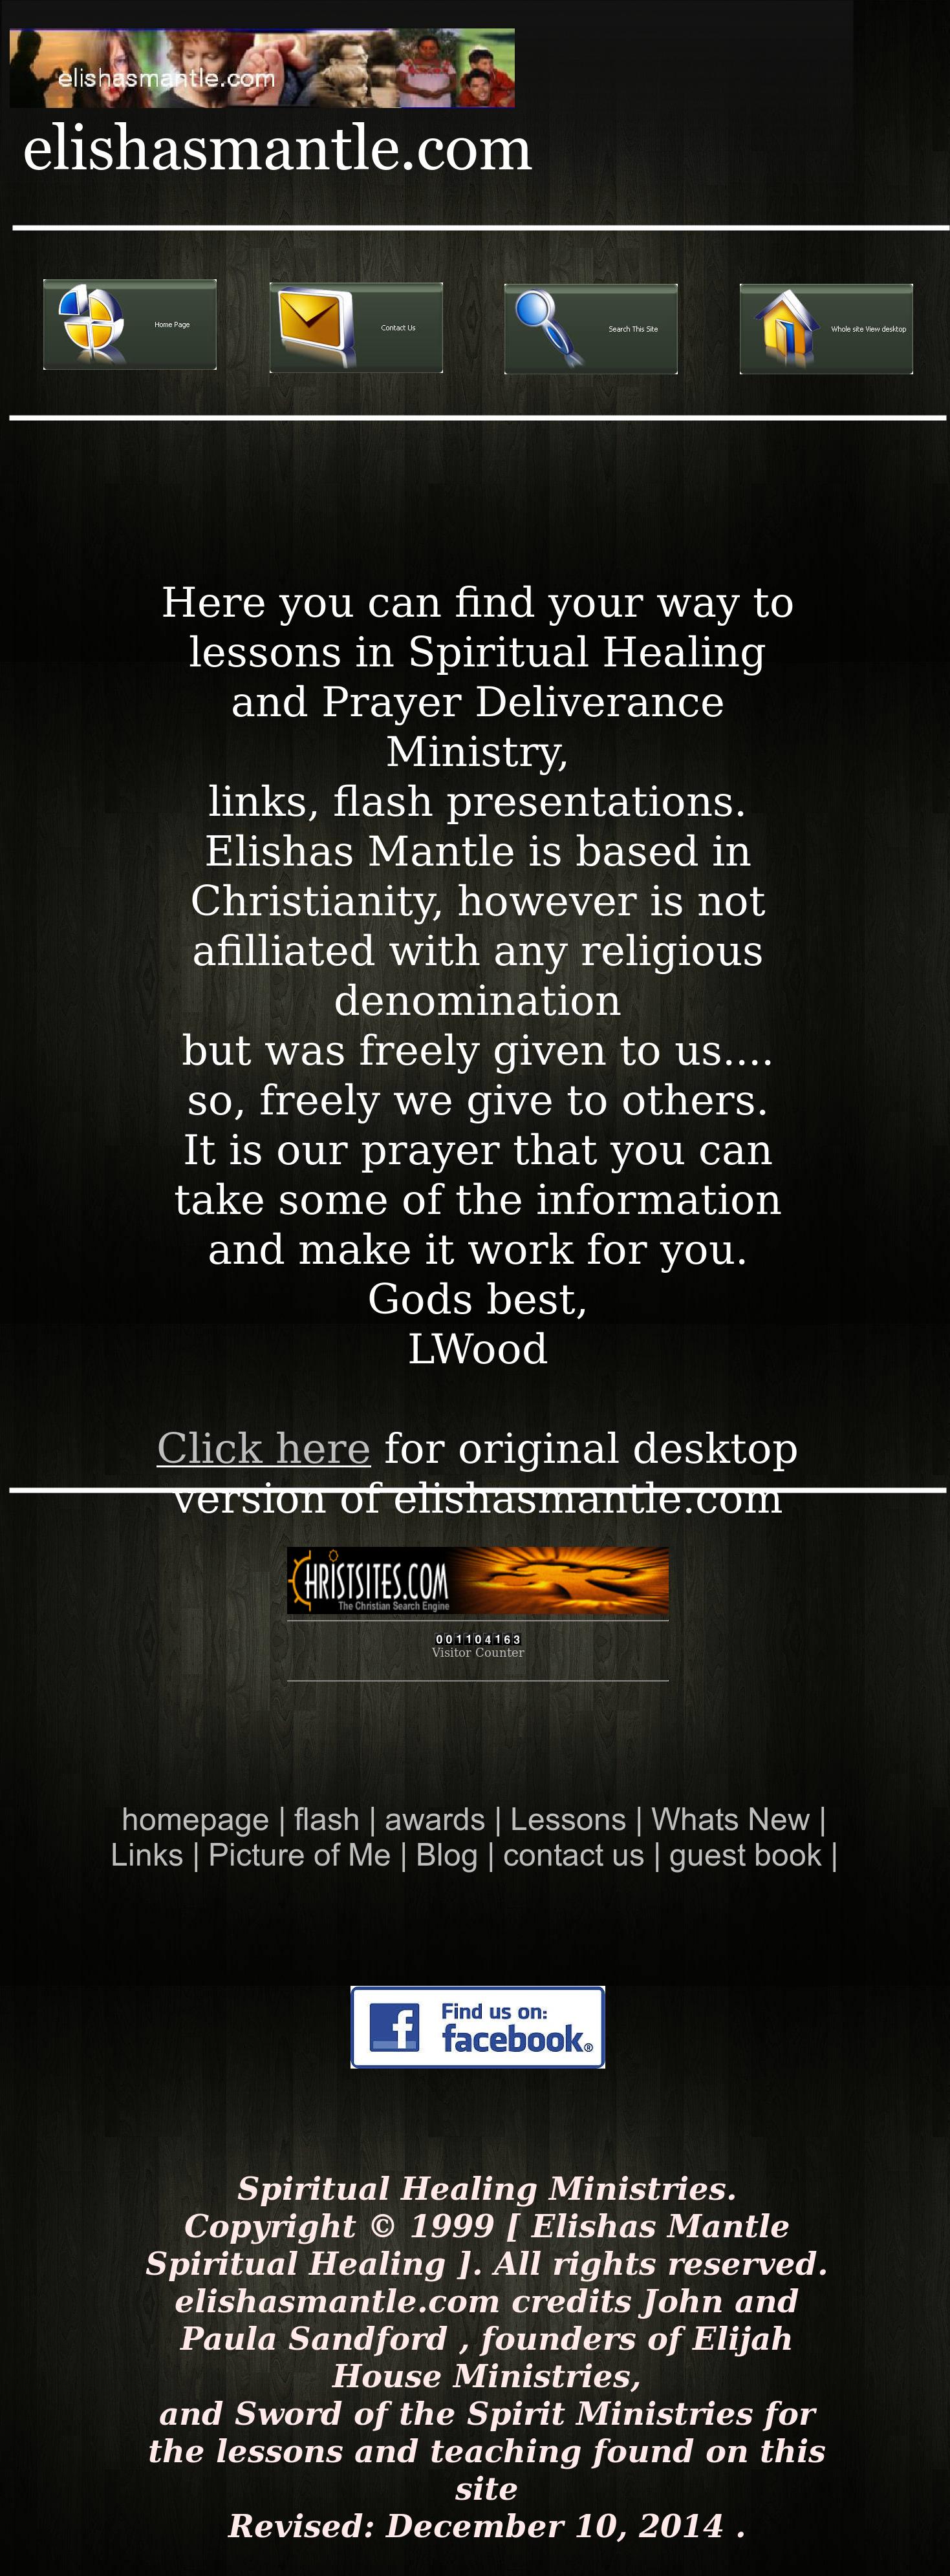 Elishas Mantle Spiritual Healing Competitors, Revenue and